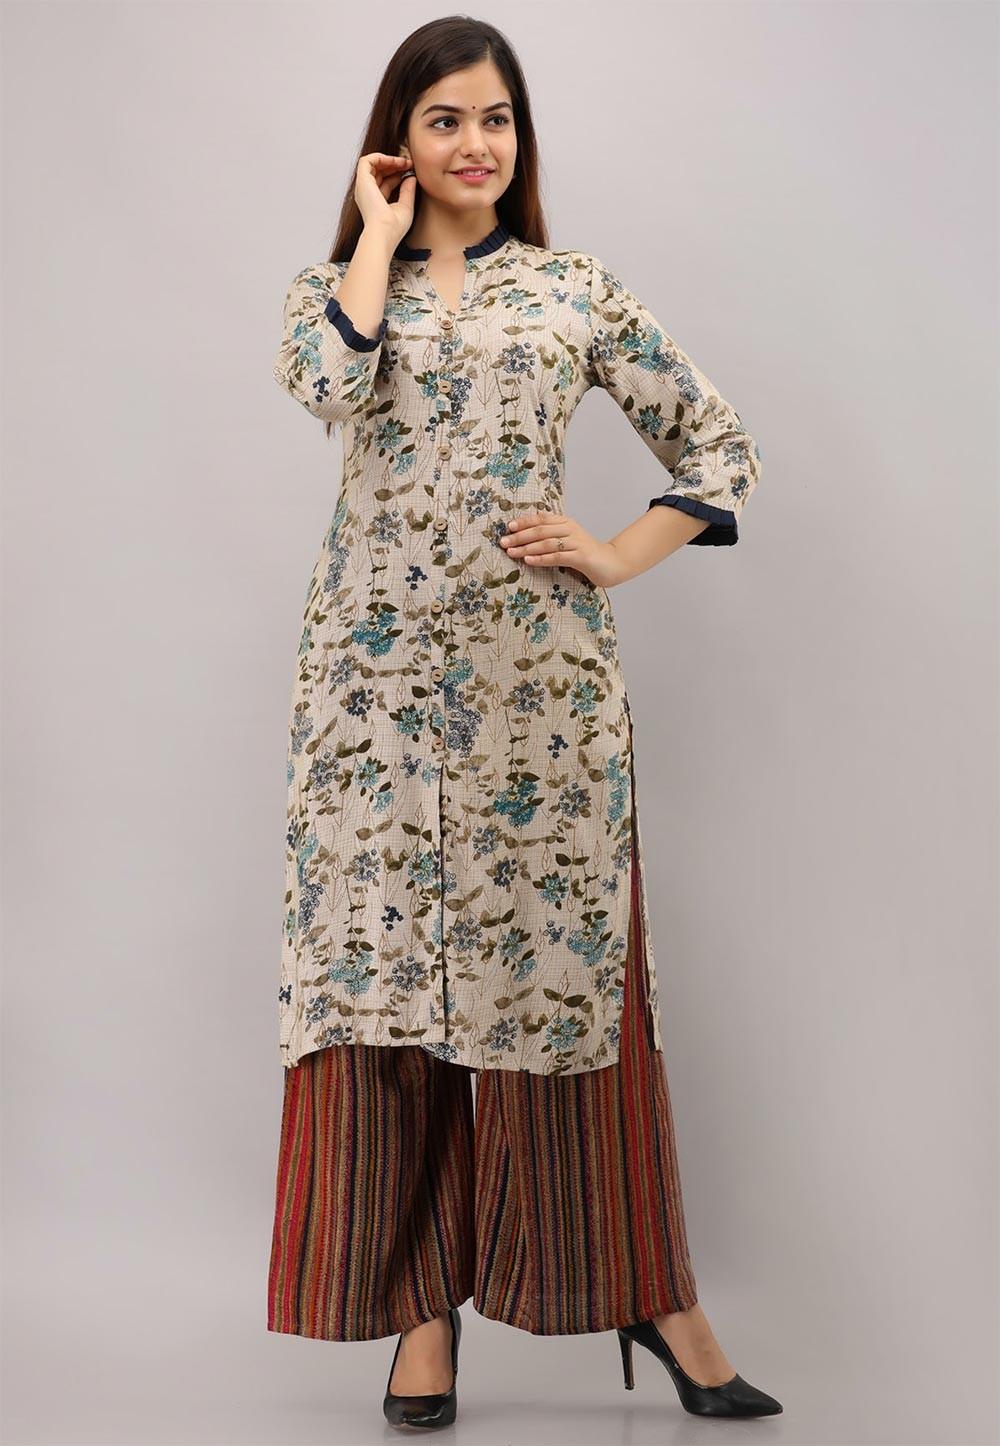 Beige Colour Rayon Cotton Fabric Readymade Kurti.